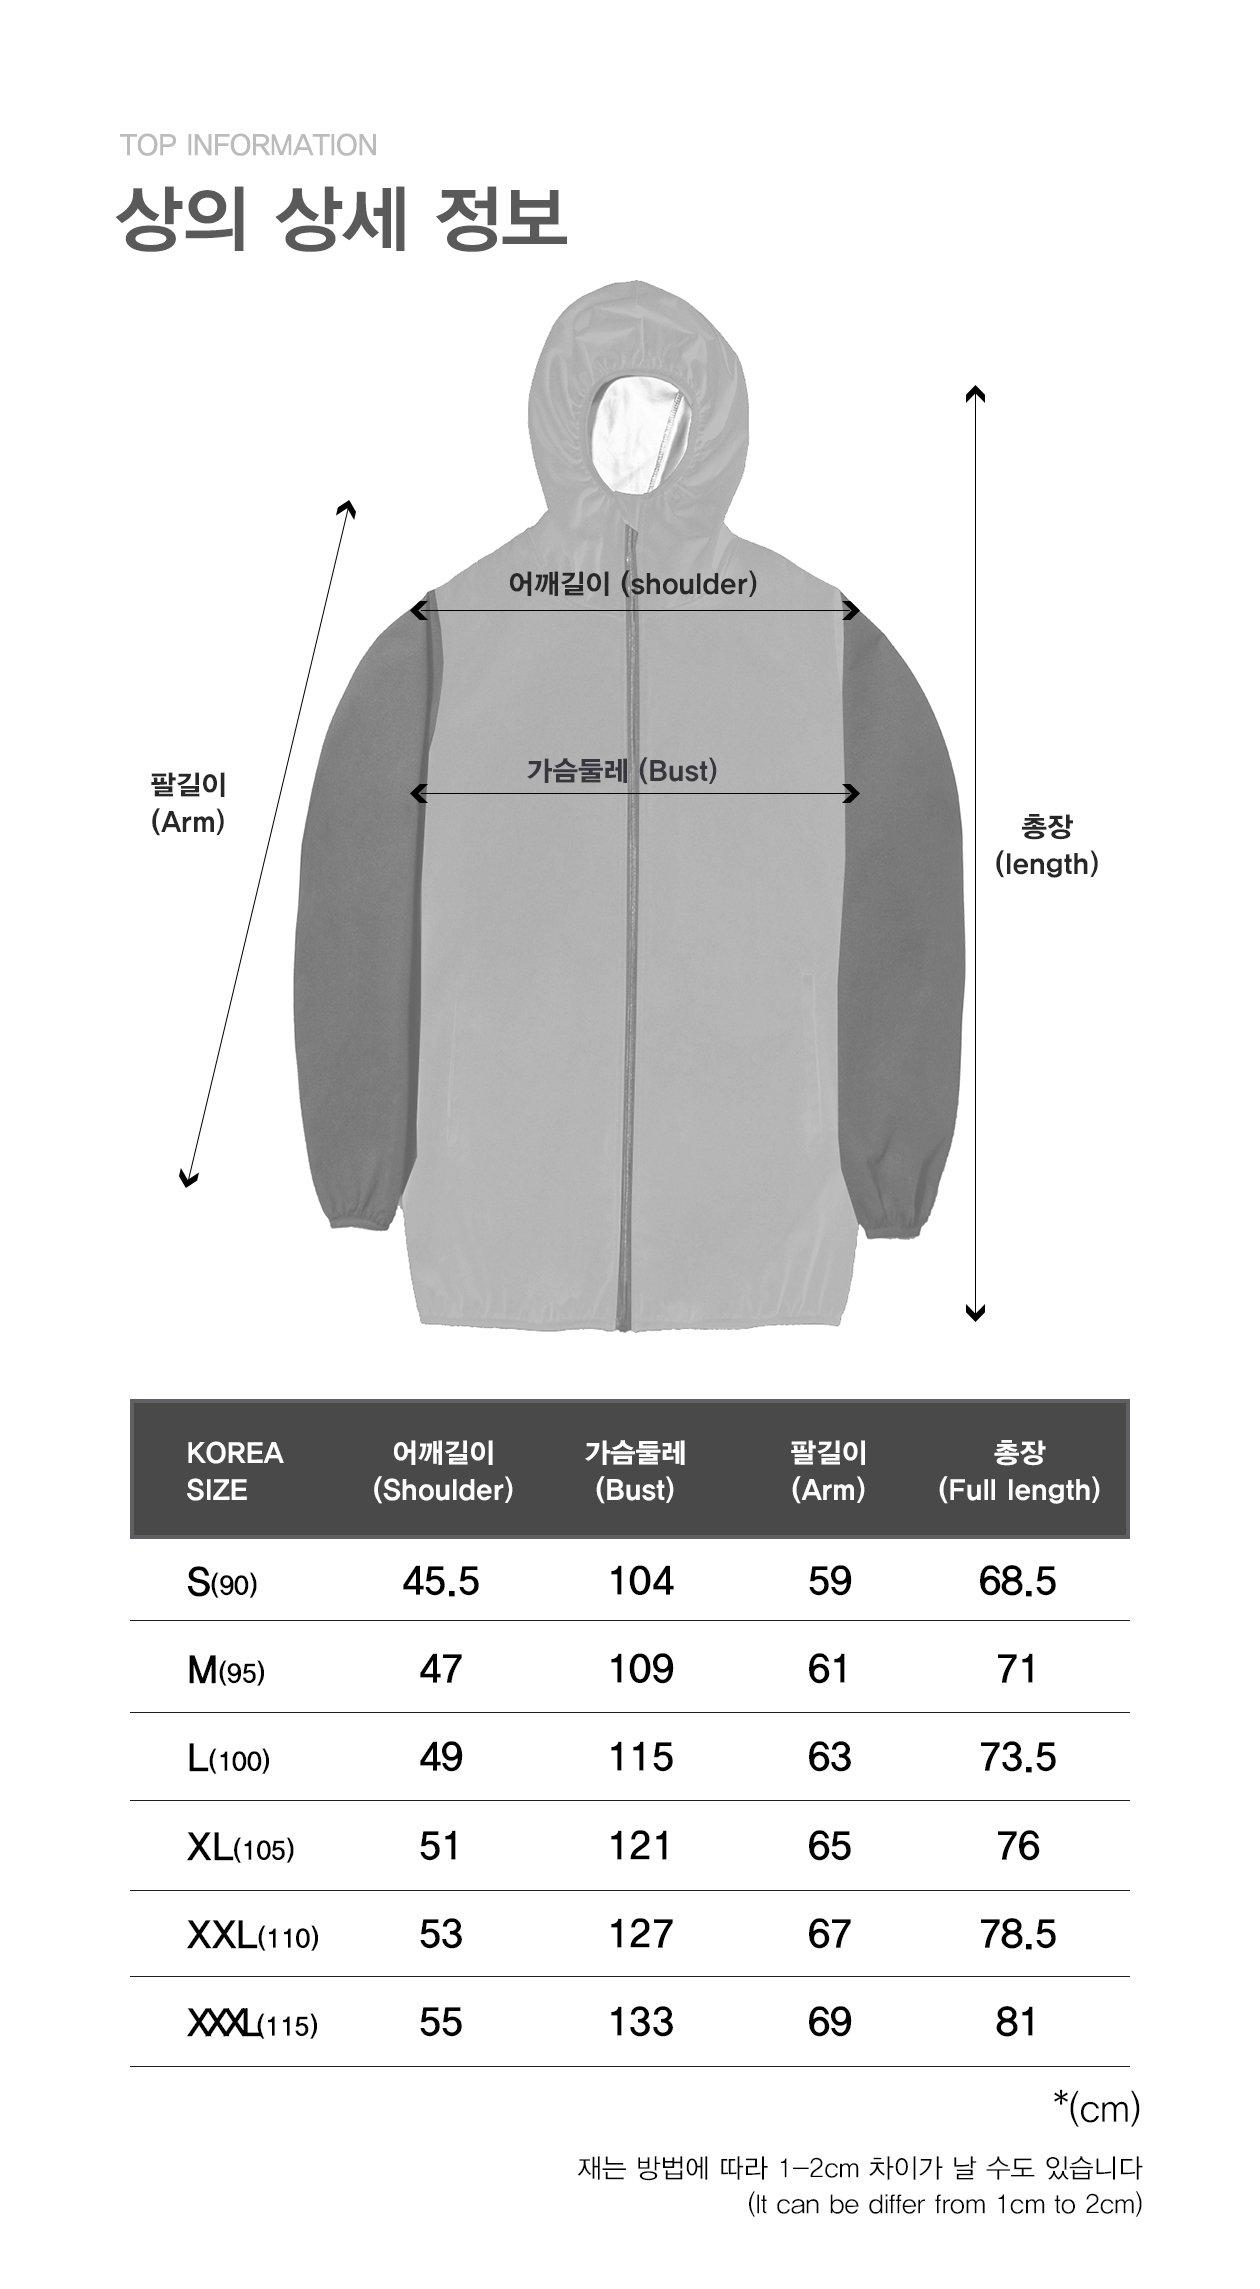 KOREA SIZE 어깨길이(Shoulder) S(90) 45.5 M(95) 47 L(100) 49 XL(105) 51 XXL(110) 53 XXXL(115) 55 가슴둘레(Busd) S(90) 104 M(95) 109 L(100) 115 XL(105) 121 XXL(110) 127 XXXL(115) 133 팔길이(Arm) S(90) 59 M(95) 61 L(100) 63 XL(105) 65 XXL(110) 57 XXXL(115) 69 총장(Full length) S(90) 68.5 M(95) 71 L(100) 73.5 XL(105) 76 XXL(110) 78.5 XXXL(115) 81 *(cm) 재는 방법에 따라 1~2cm 차이가 날 수도 있습니다(It can be differ from 1cm to 2cm)